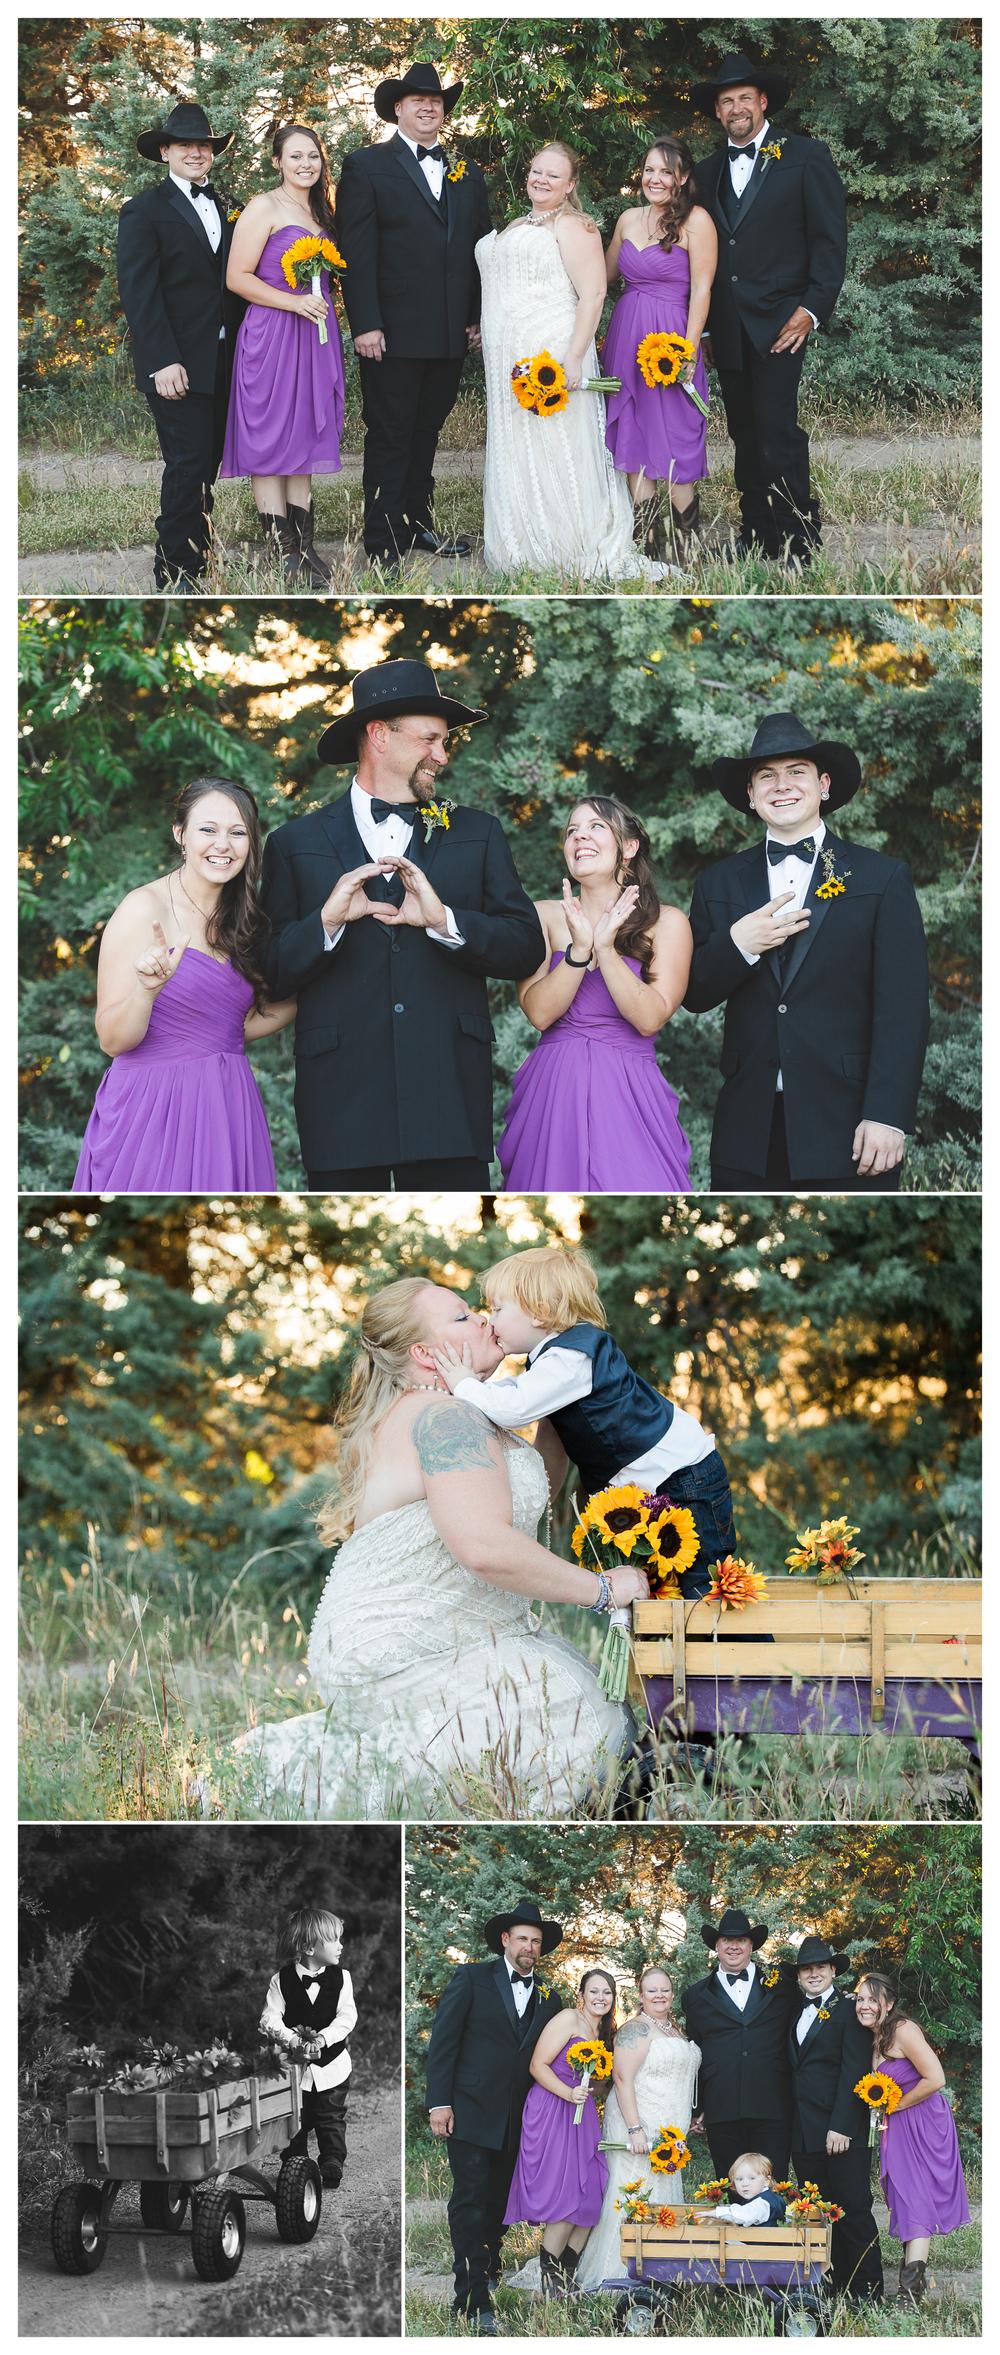 wed party-1.jpg